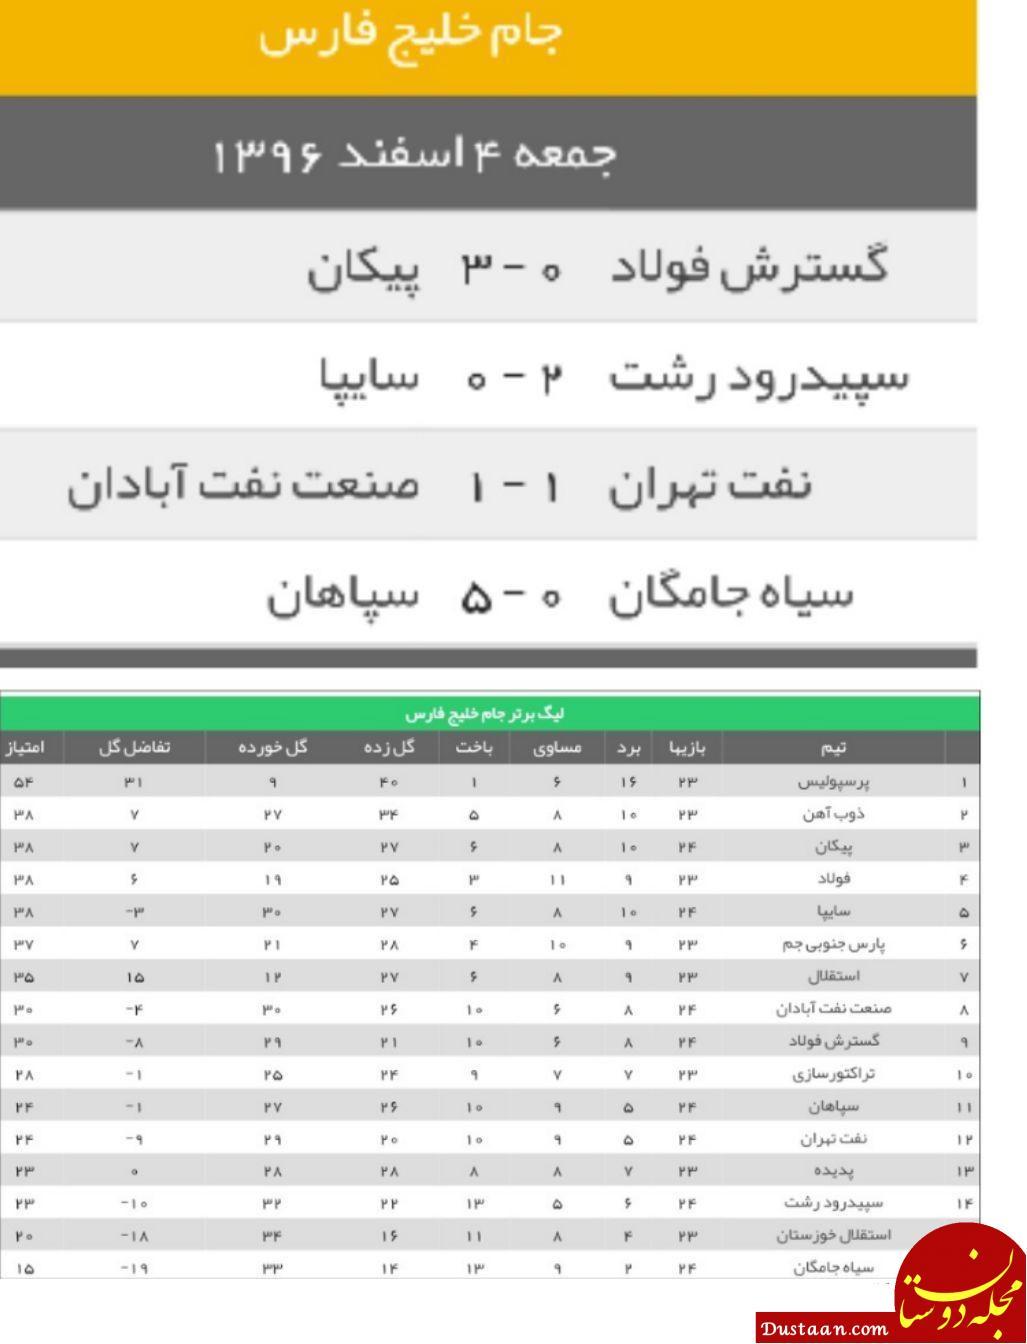 www.dustaan.com نتایج دیدارهای امروز در هفته بیست و چهارم لیگ برتر